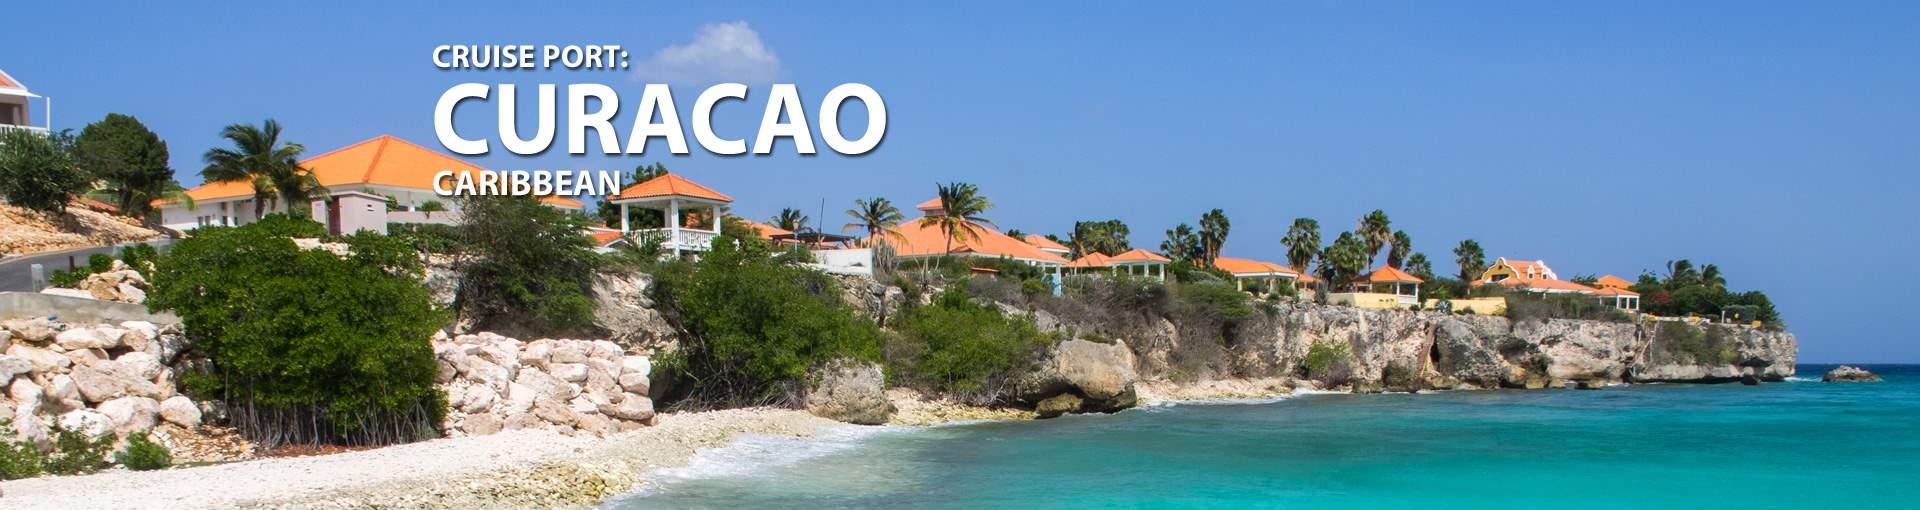 Cruises to Curacao, Caribbean